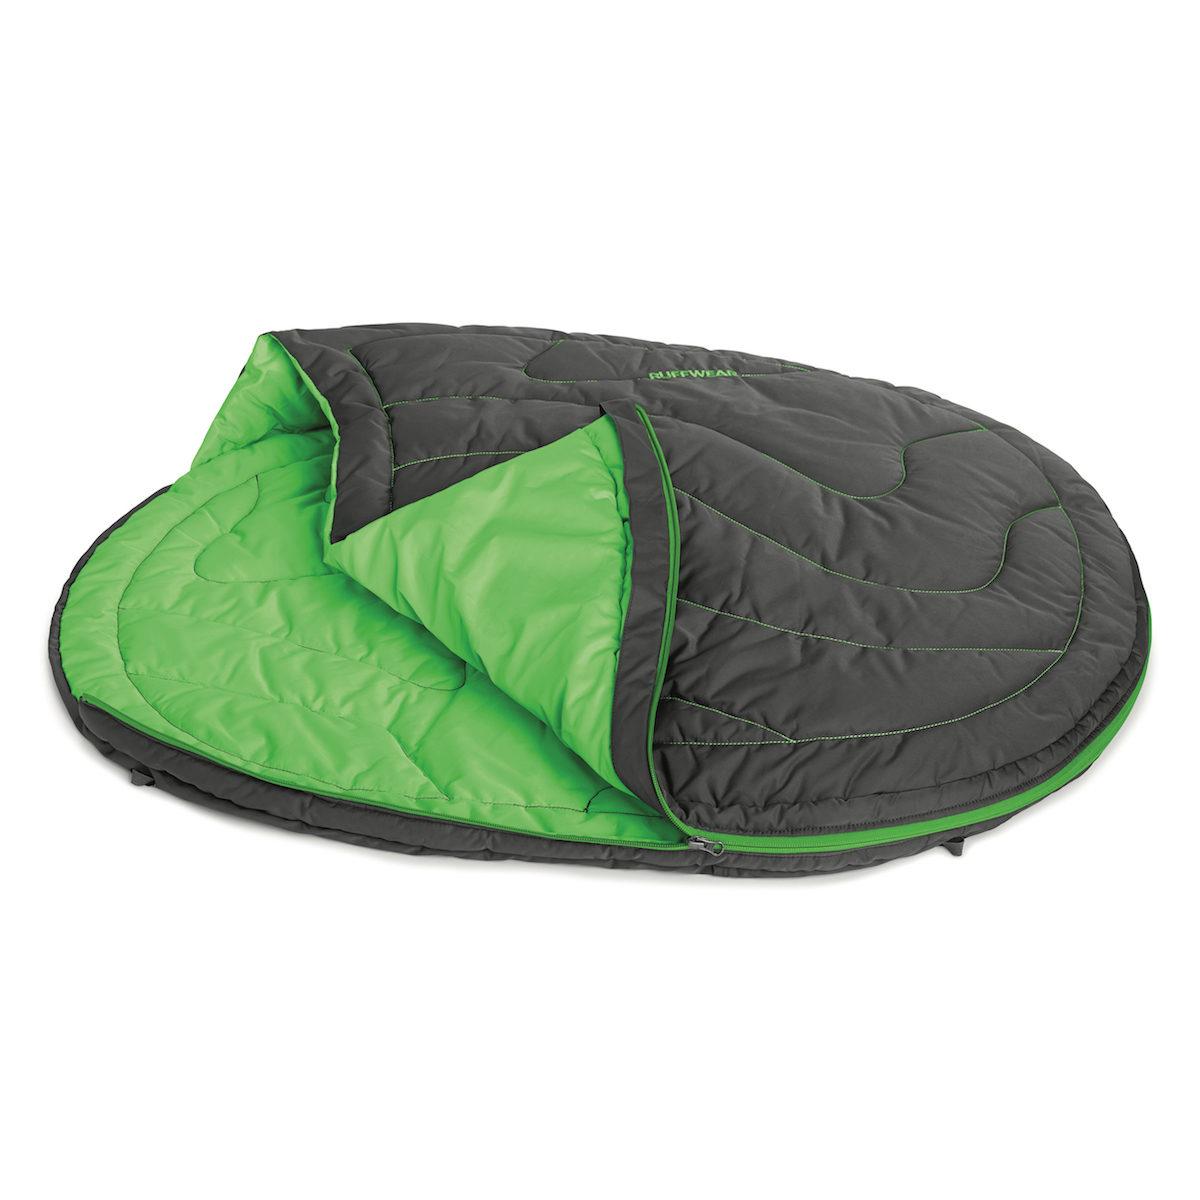 Highlands Sleeping Bag